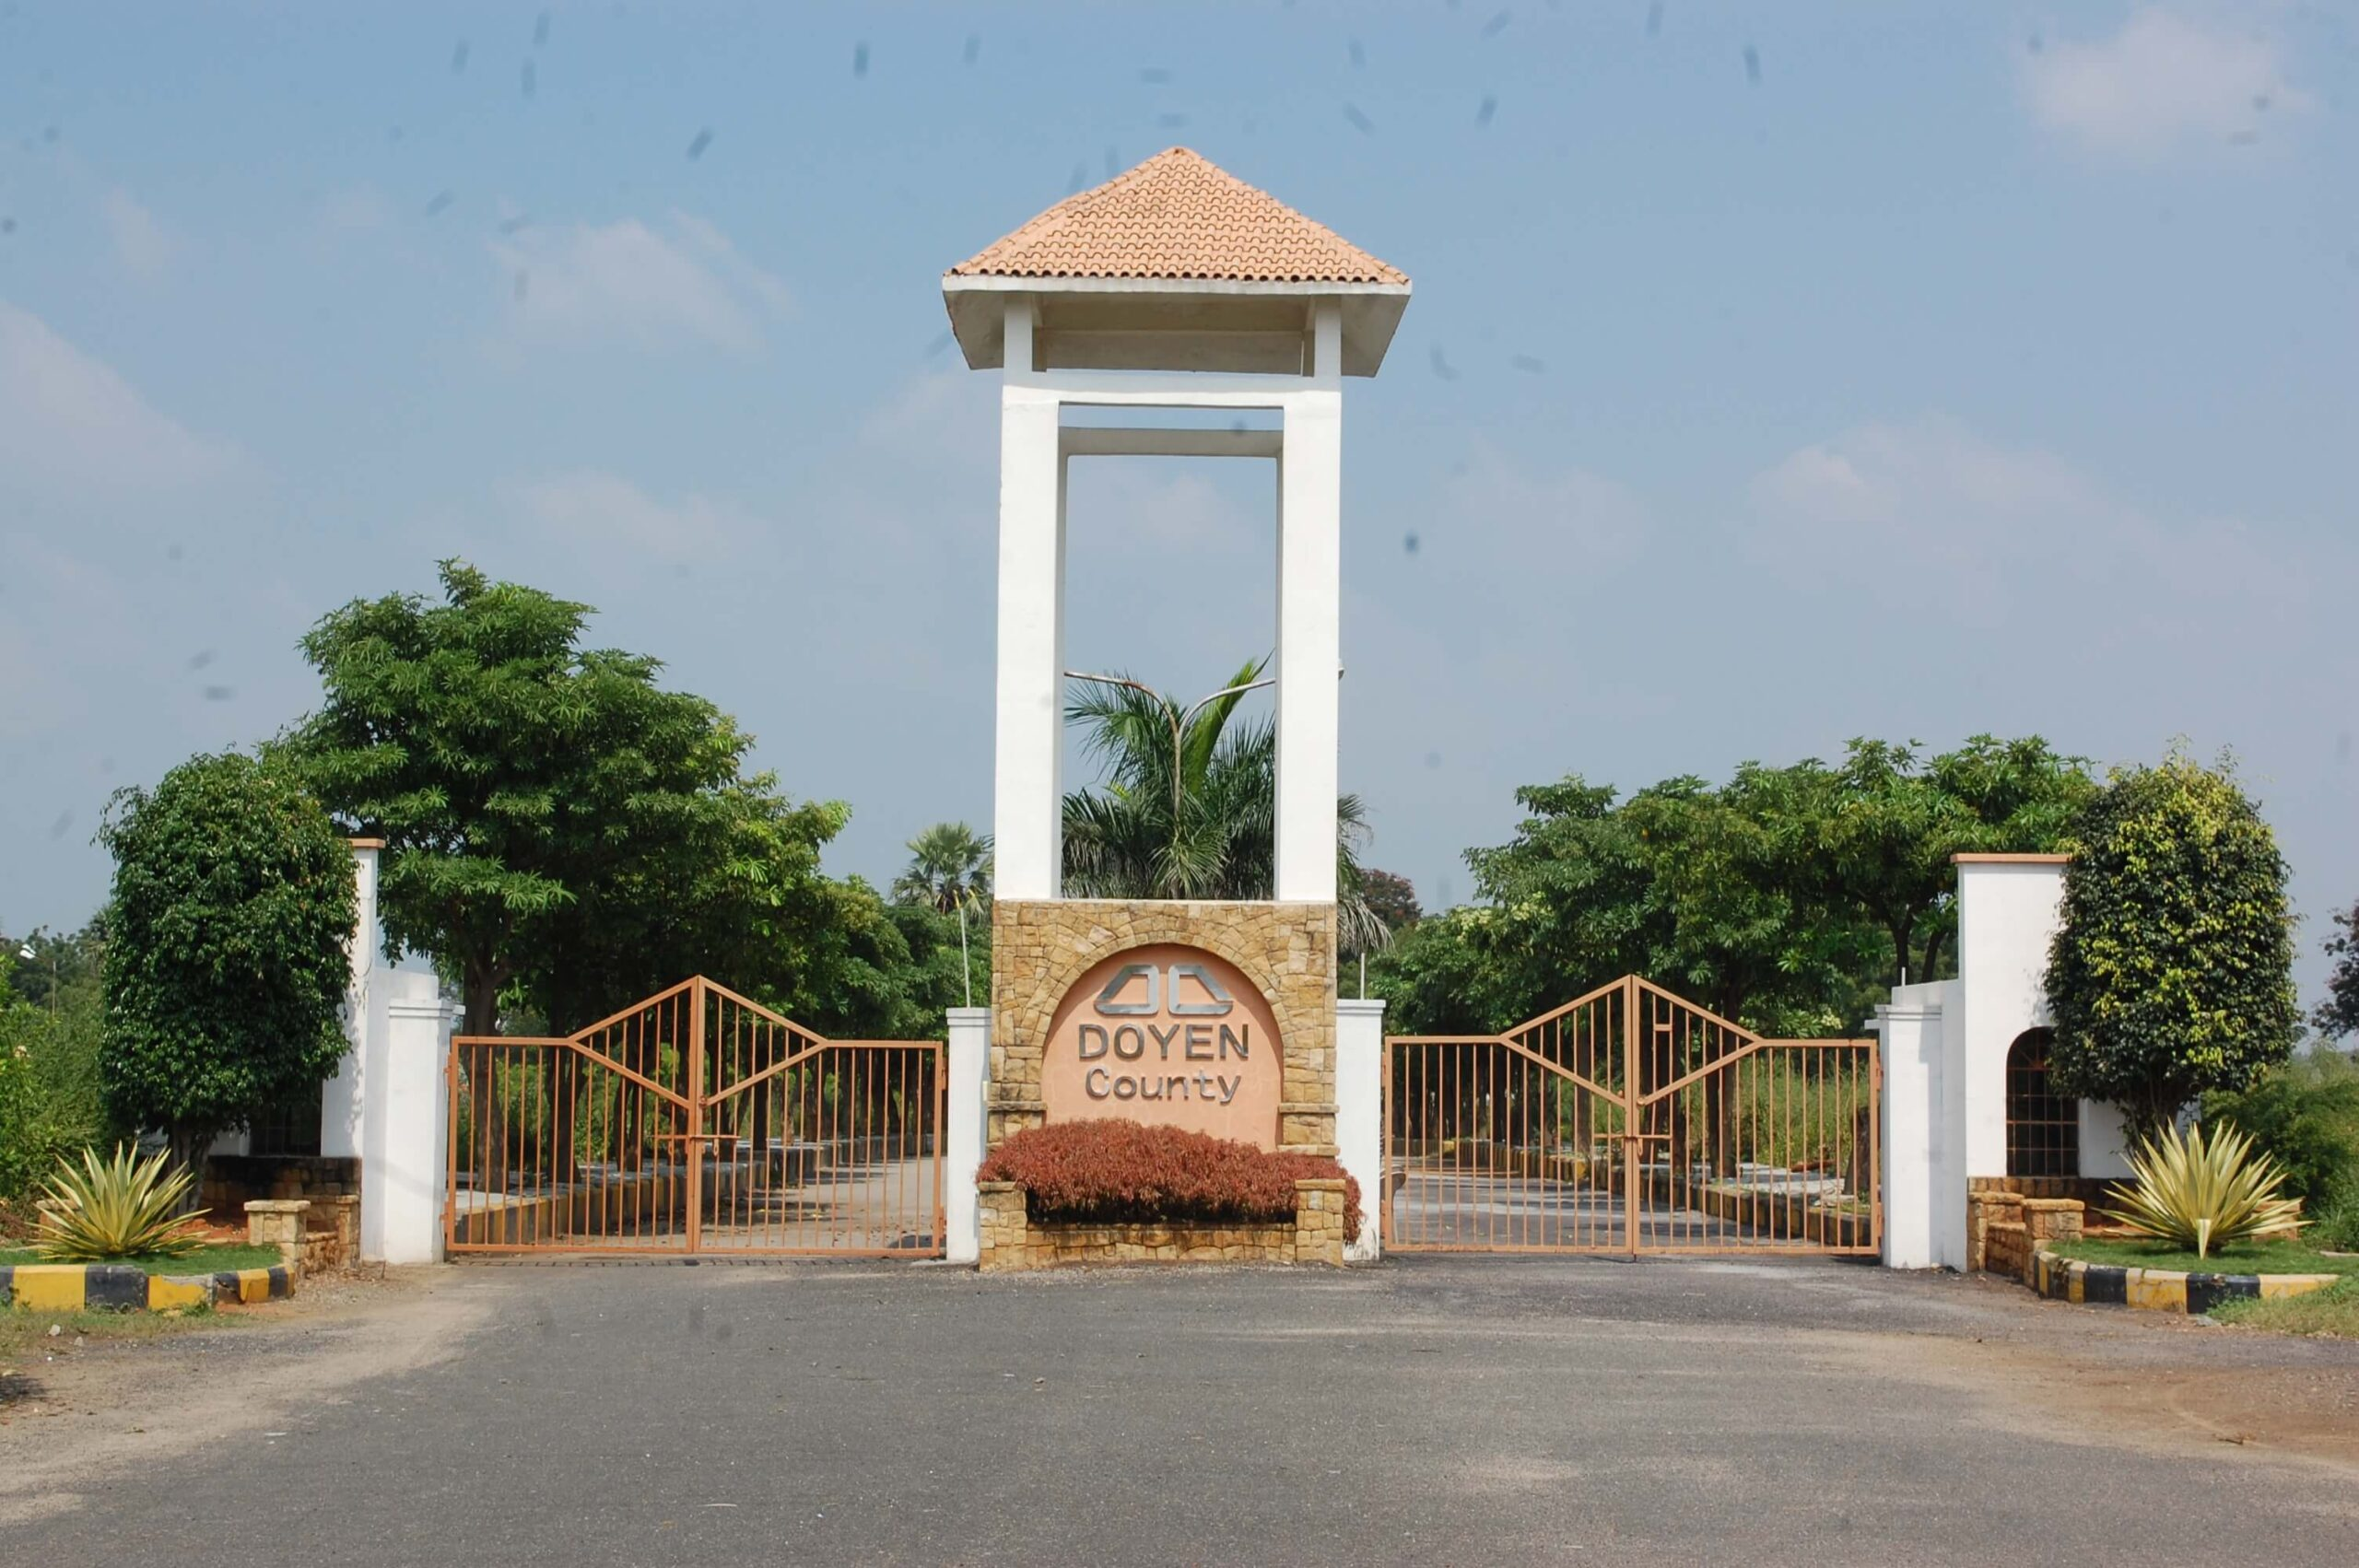 Doyen-County- Entrance